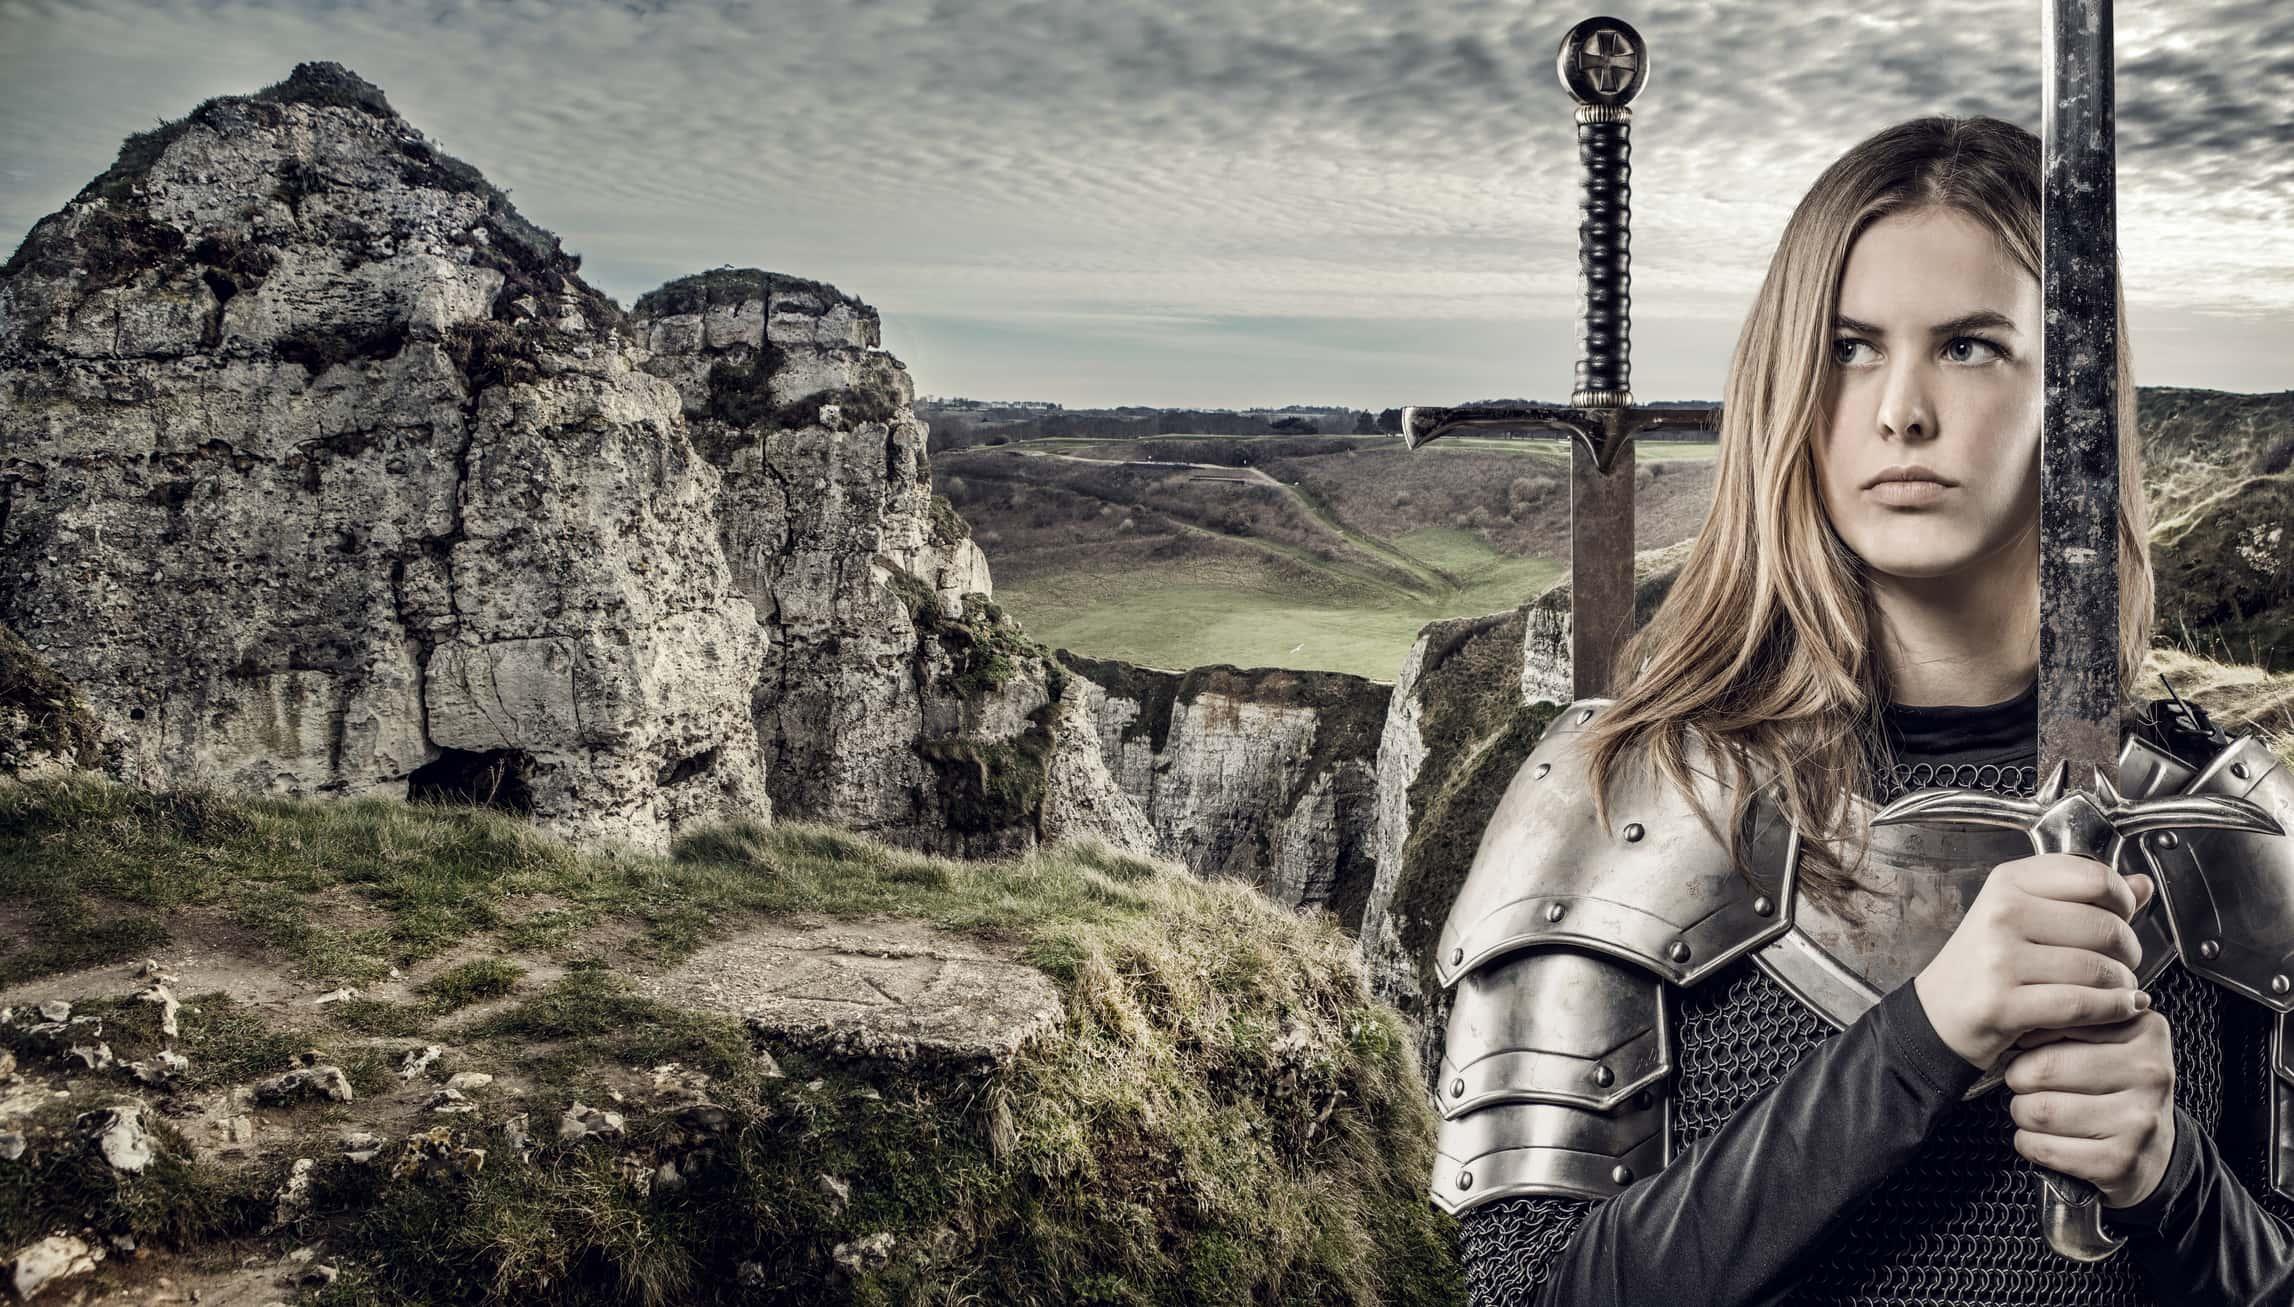 Sword wielding blond female Viking warrior.